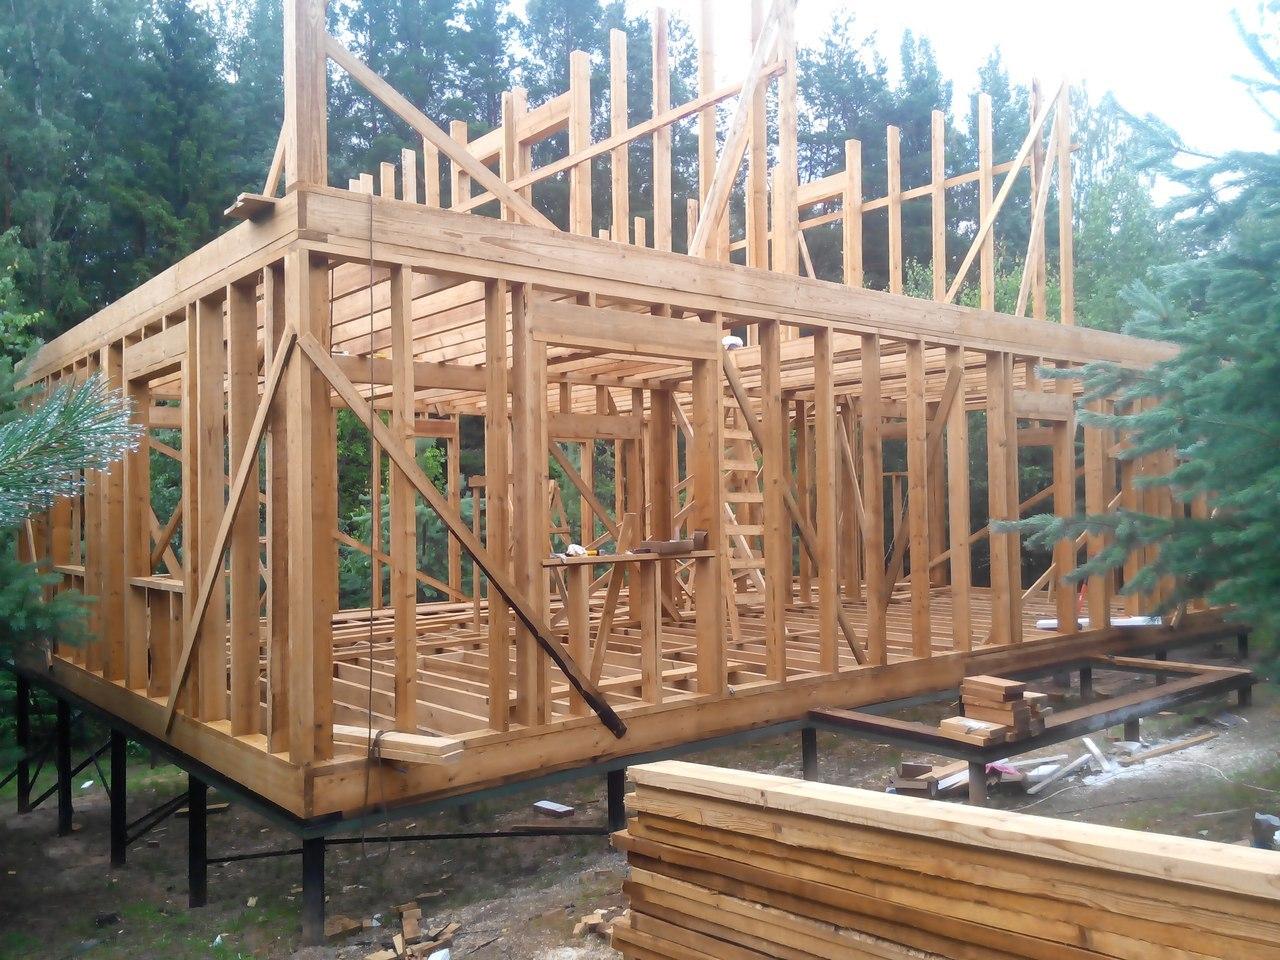 строительство дома поэтапно картинки